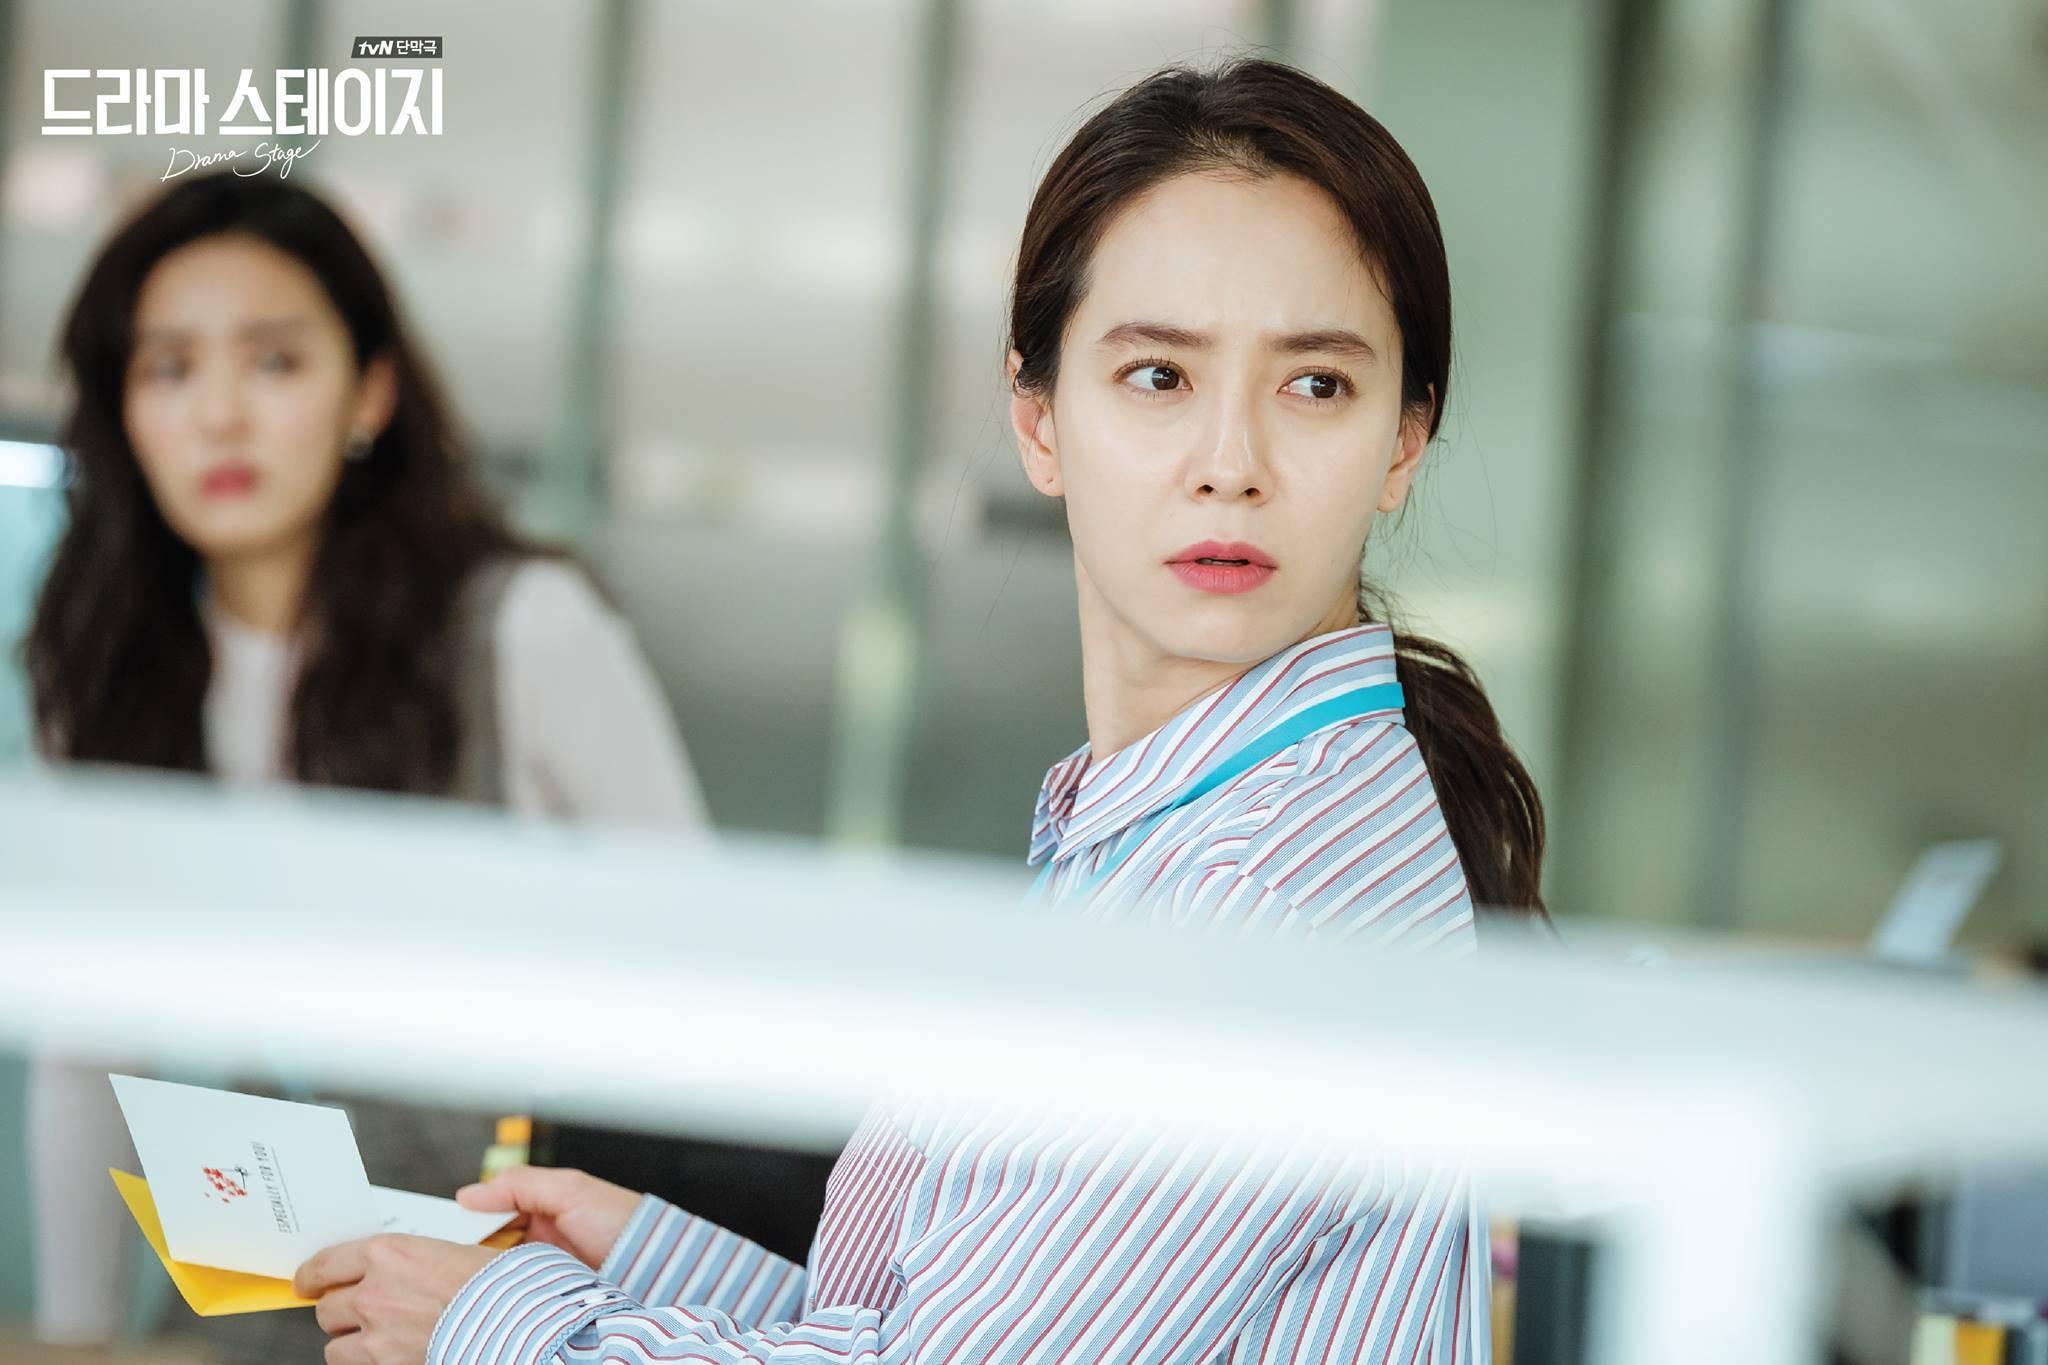 Song ji hyo dating manager